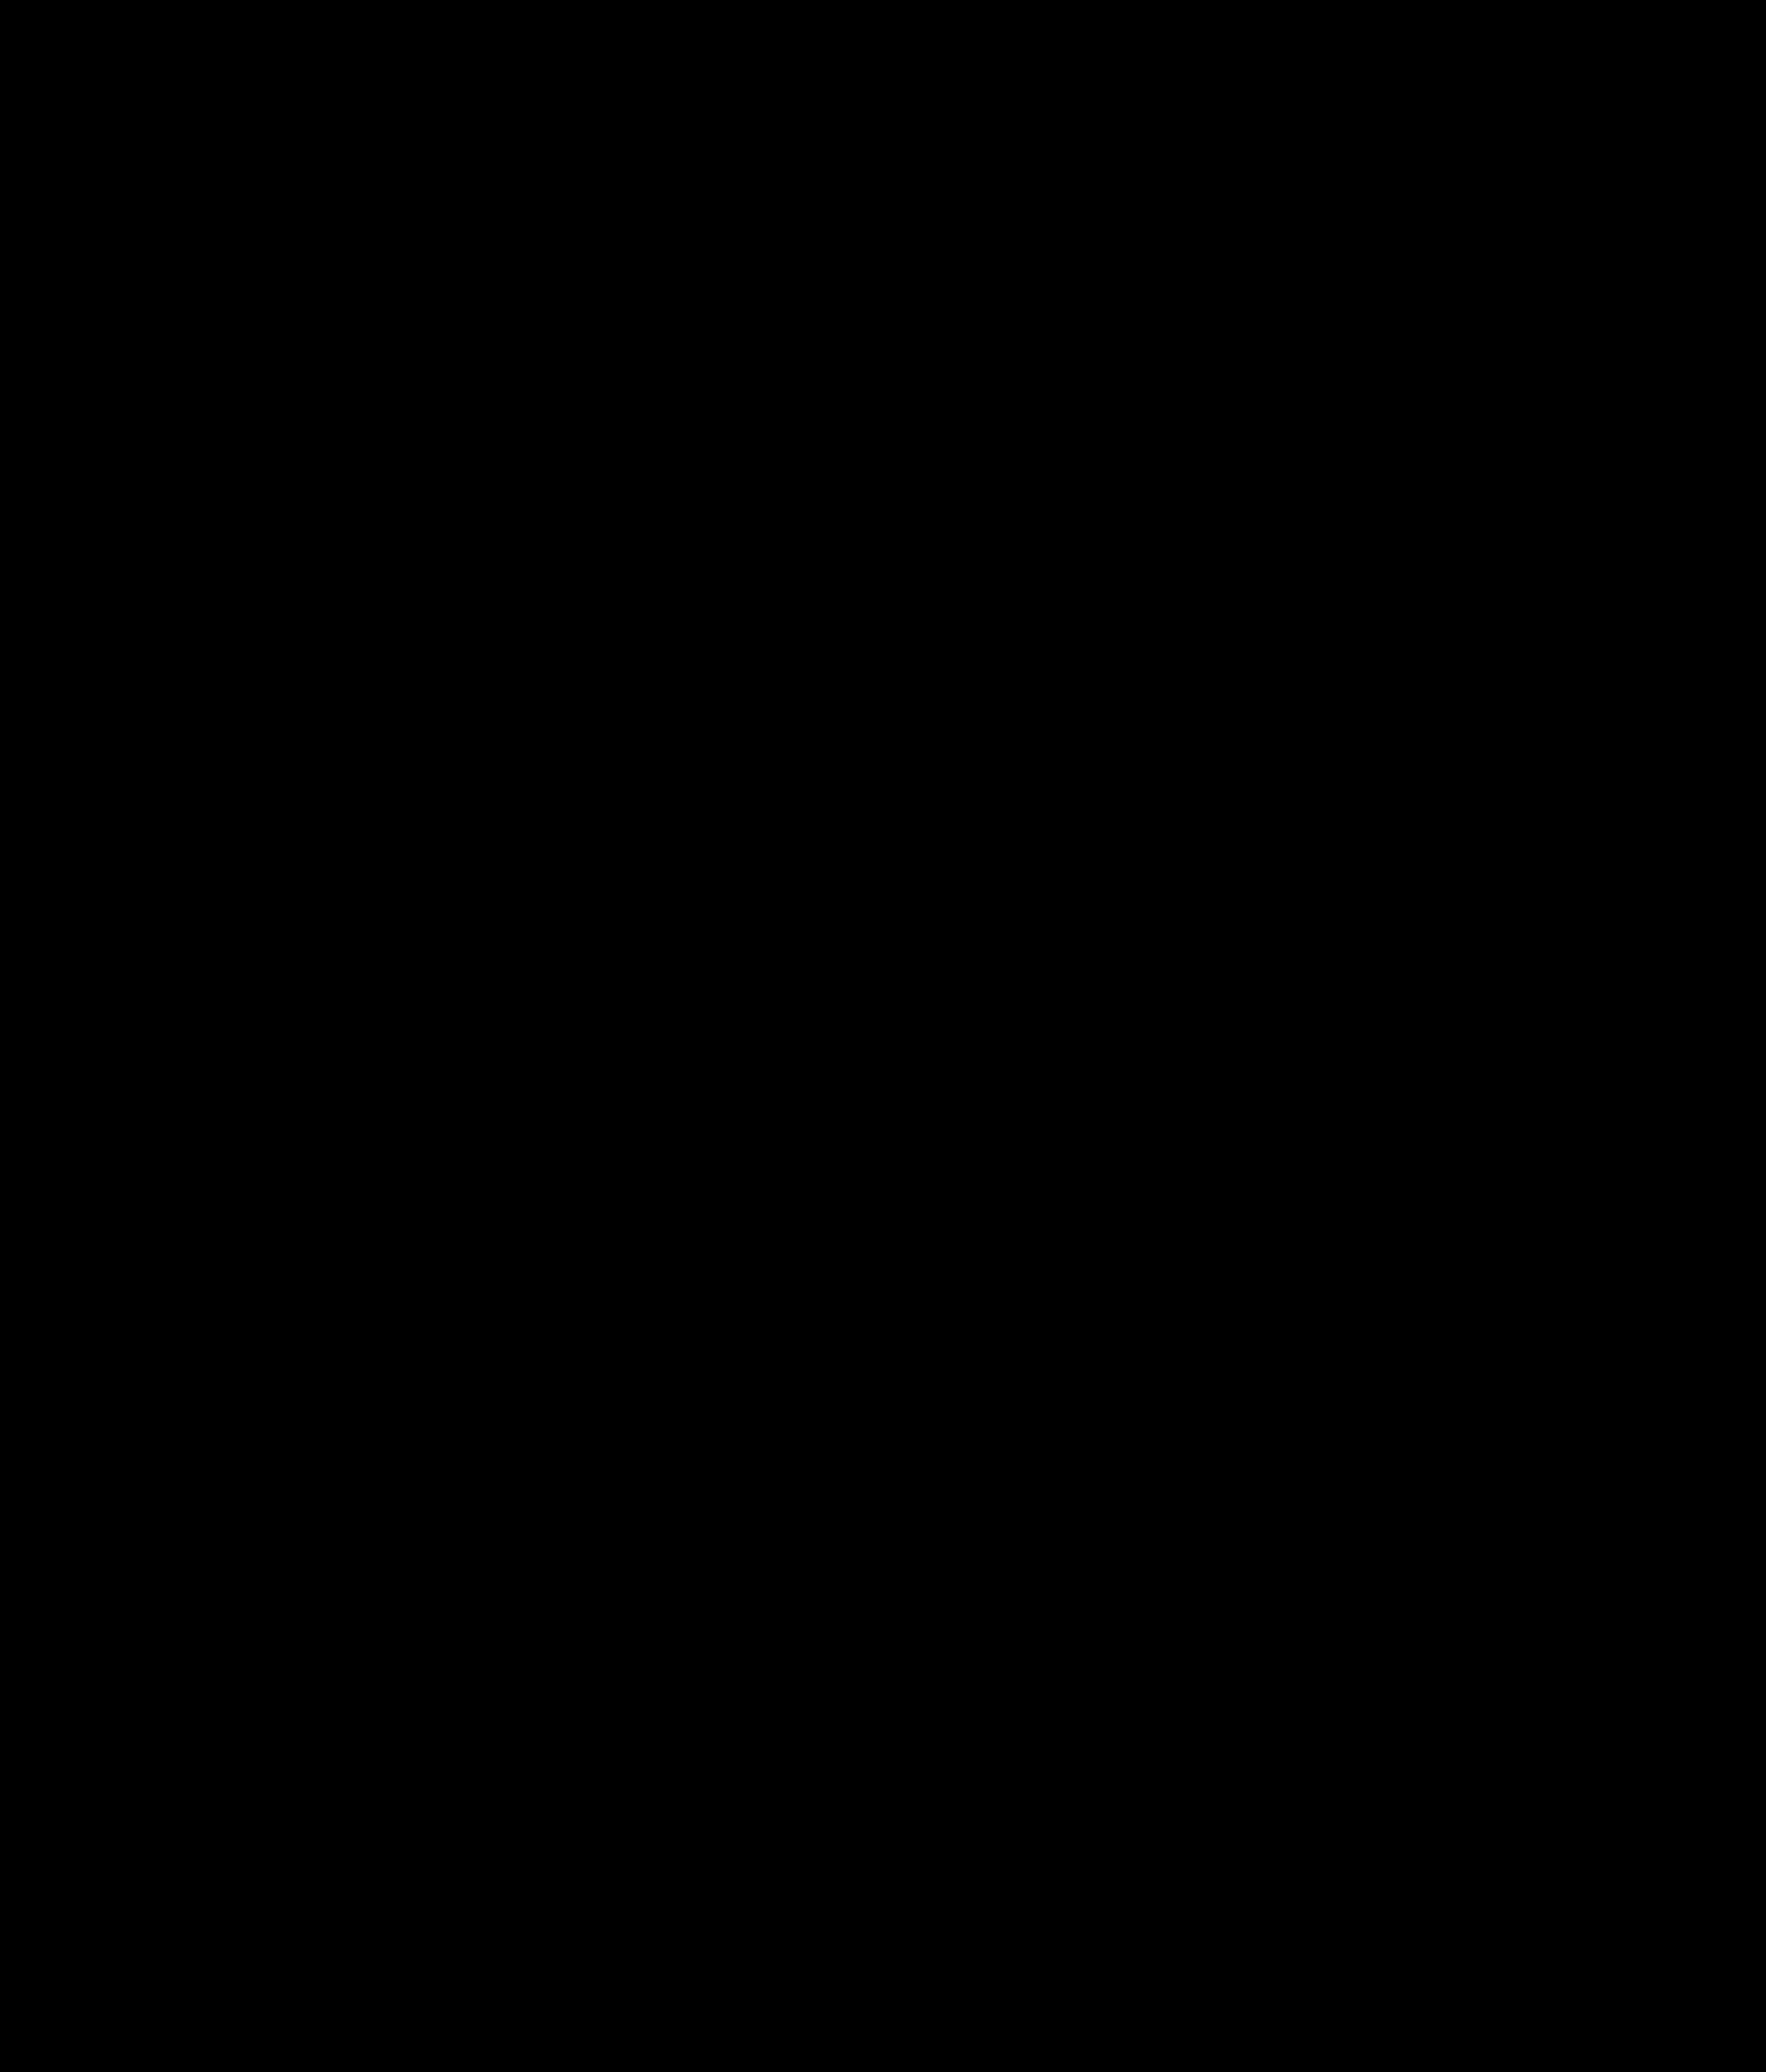 Hemlock tree clipart vector transparent library Clipart - Hemlock vector transparent library